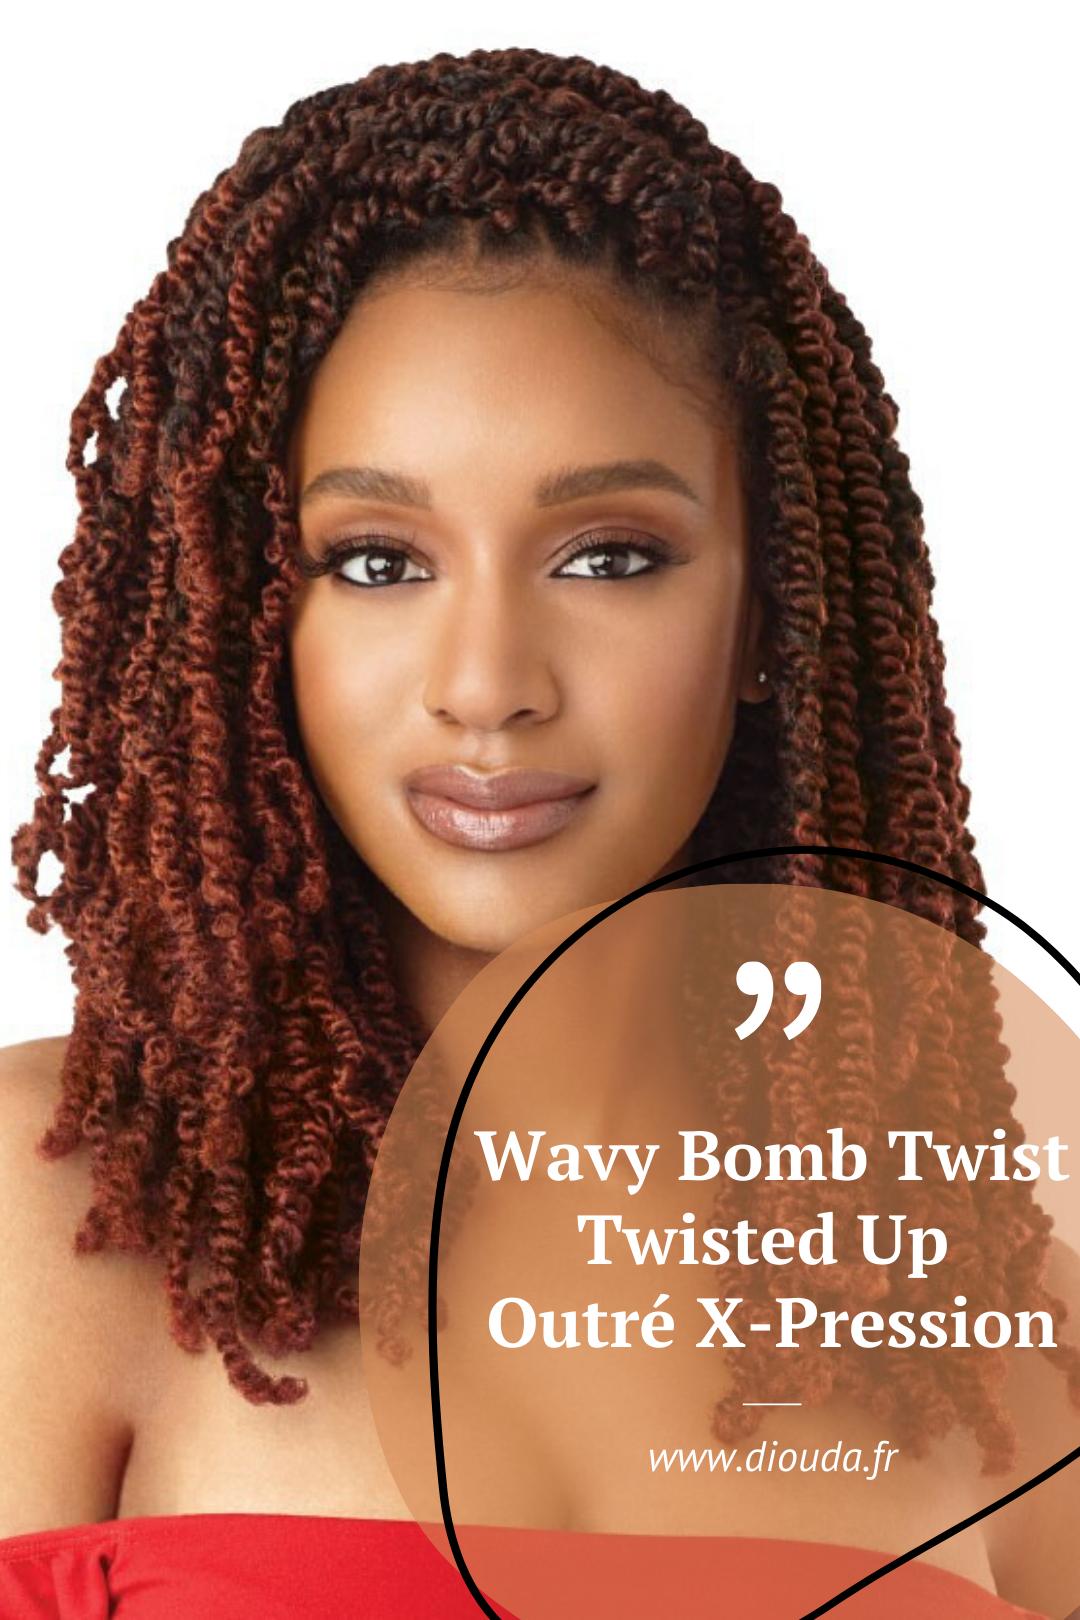 Crochet Braid Wavy Bomb Twist Coiffure Africaine Tissage Court Coiffure Africaine Tresse Meche Idee Coiffure Cheveux Crepus